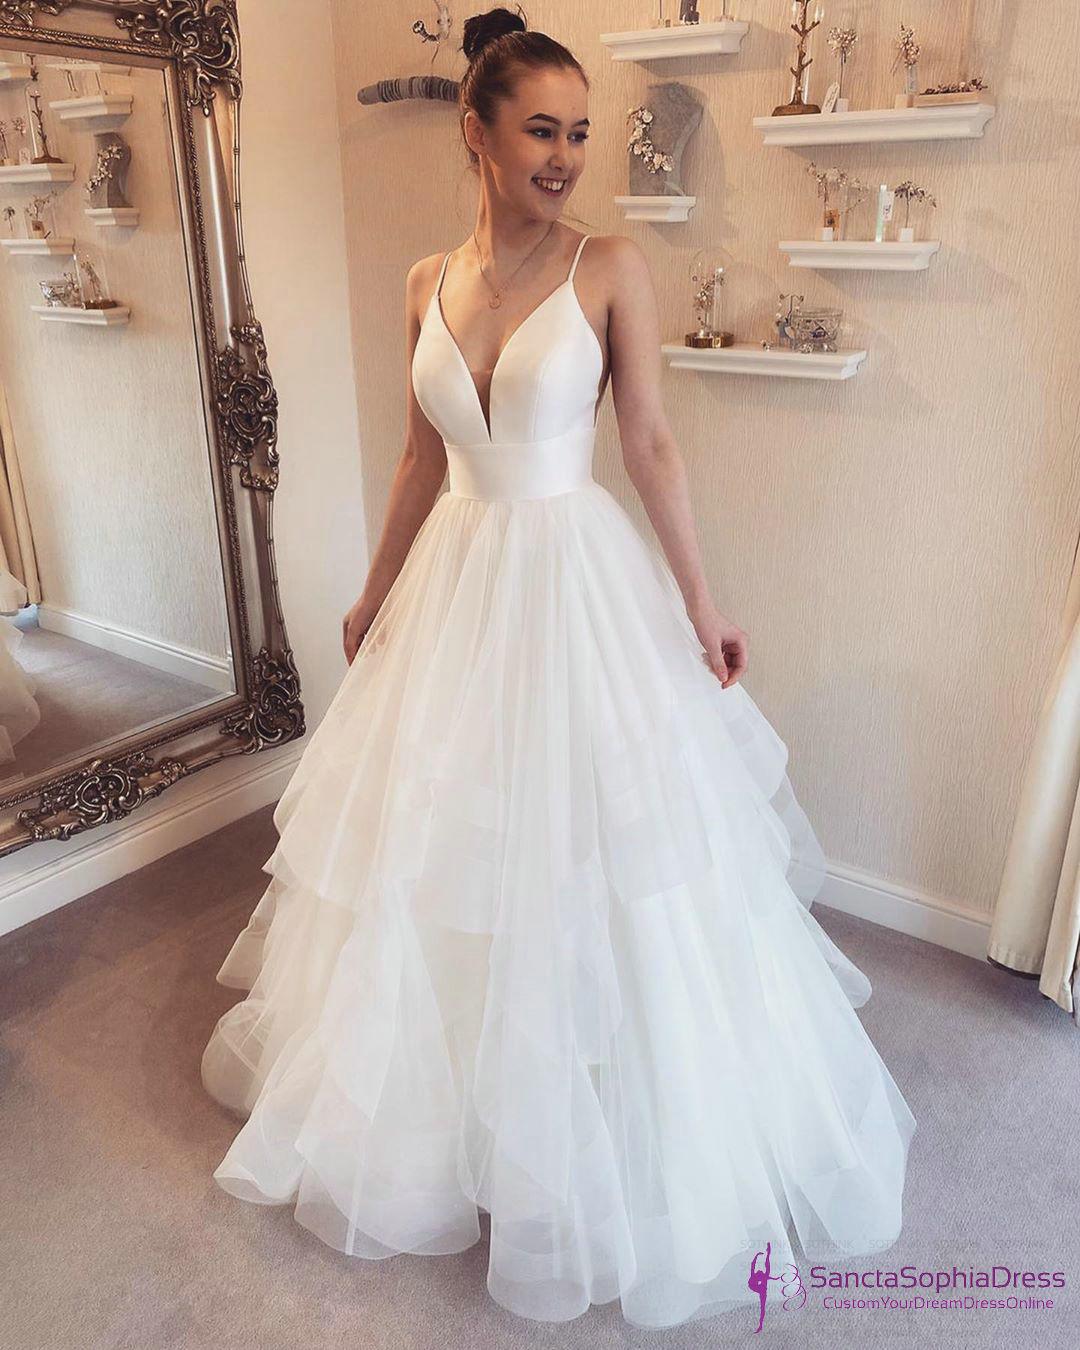 Informal Spaghetti Straps Wedding Dress Designer Wedding Dress Sancta Sophia Online Store Powered By Storenvy